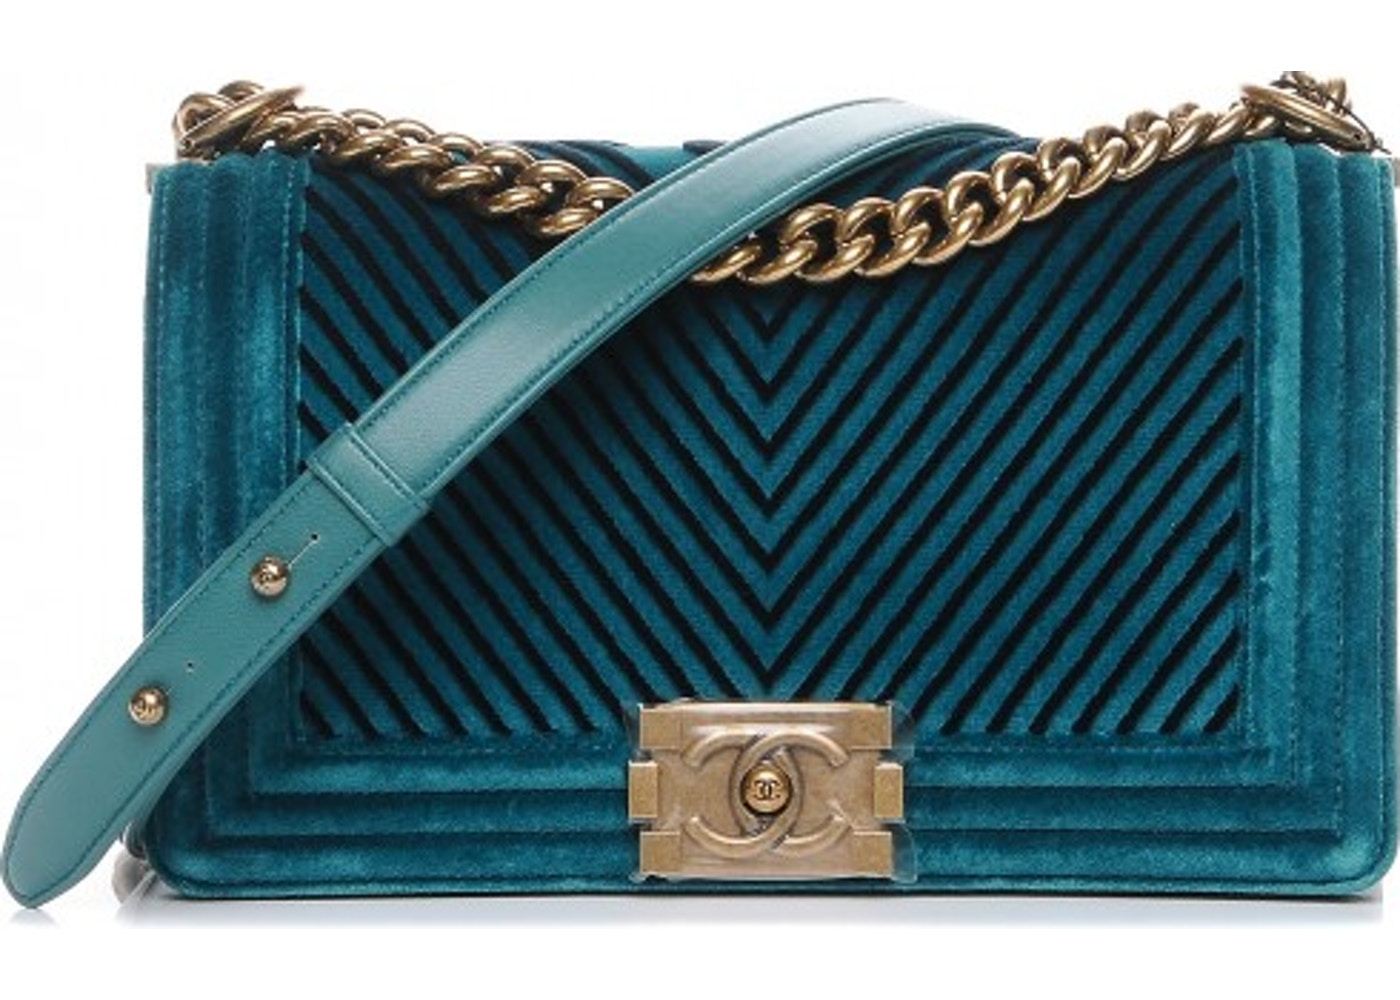 ac7222e21cad Chanel Boy Flap Chevron Velvet Medium Peacock Blue